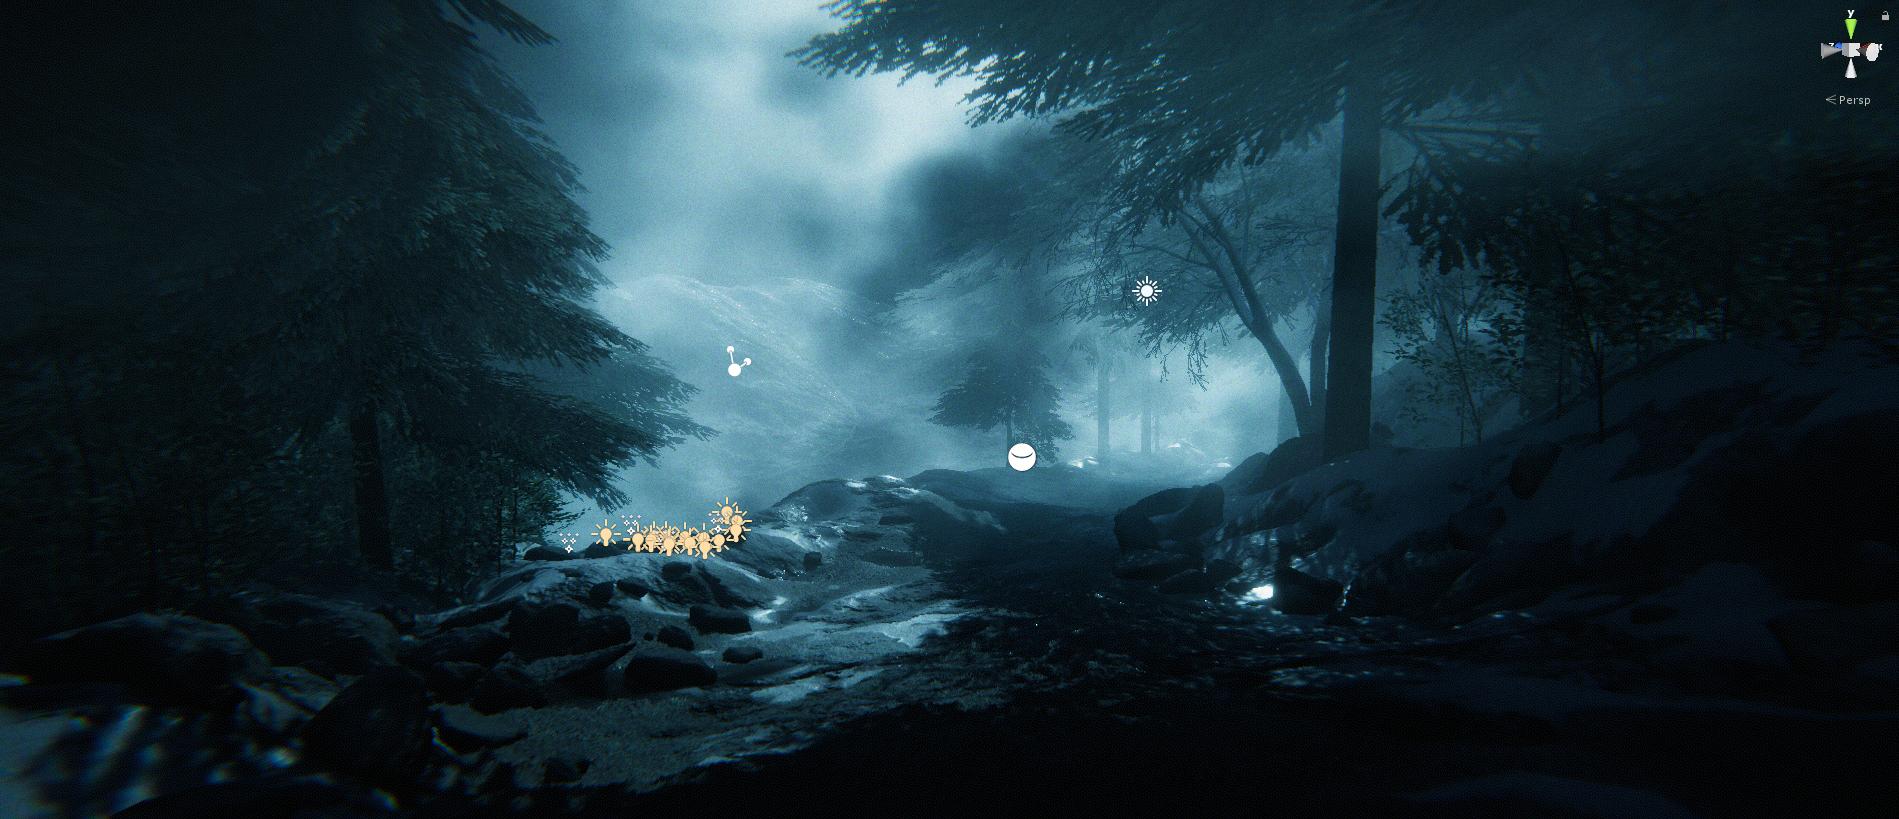 Unity Environment - Snow Mountain (Week 1)